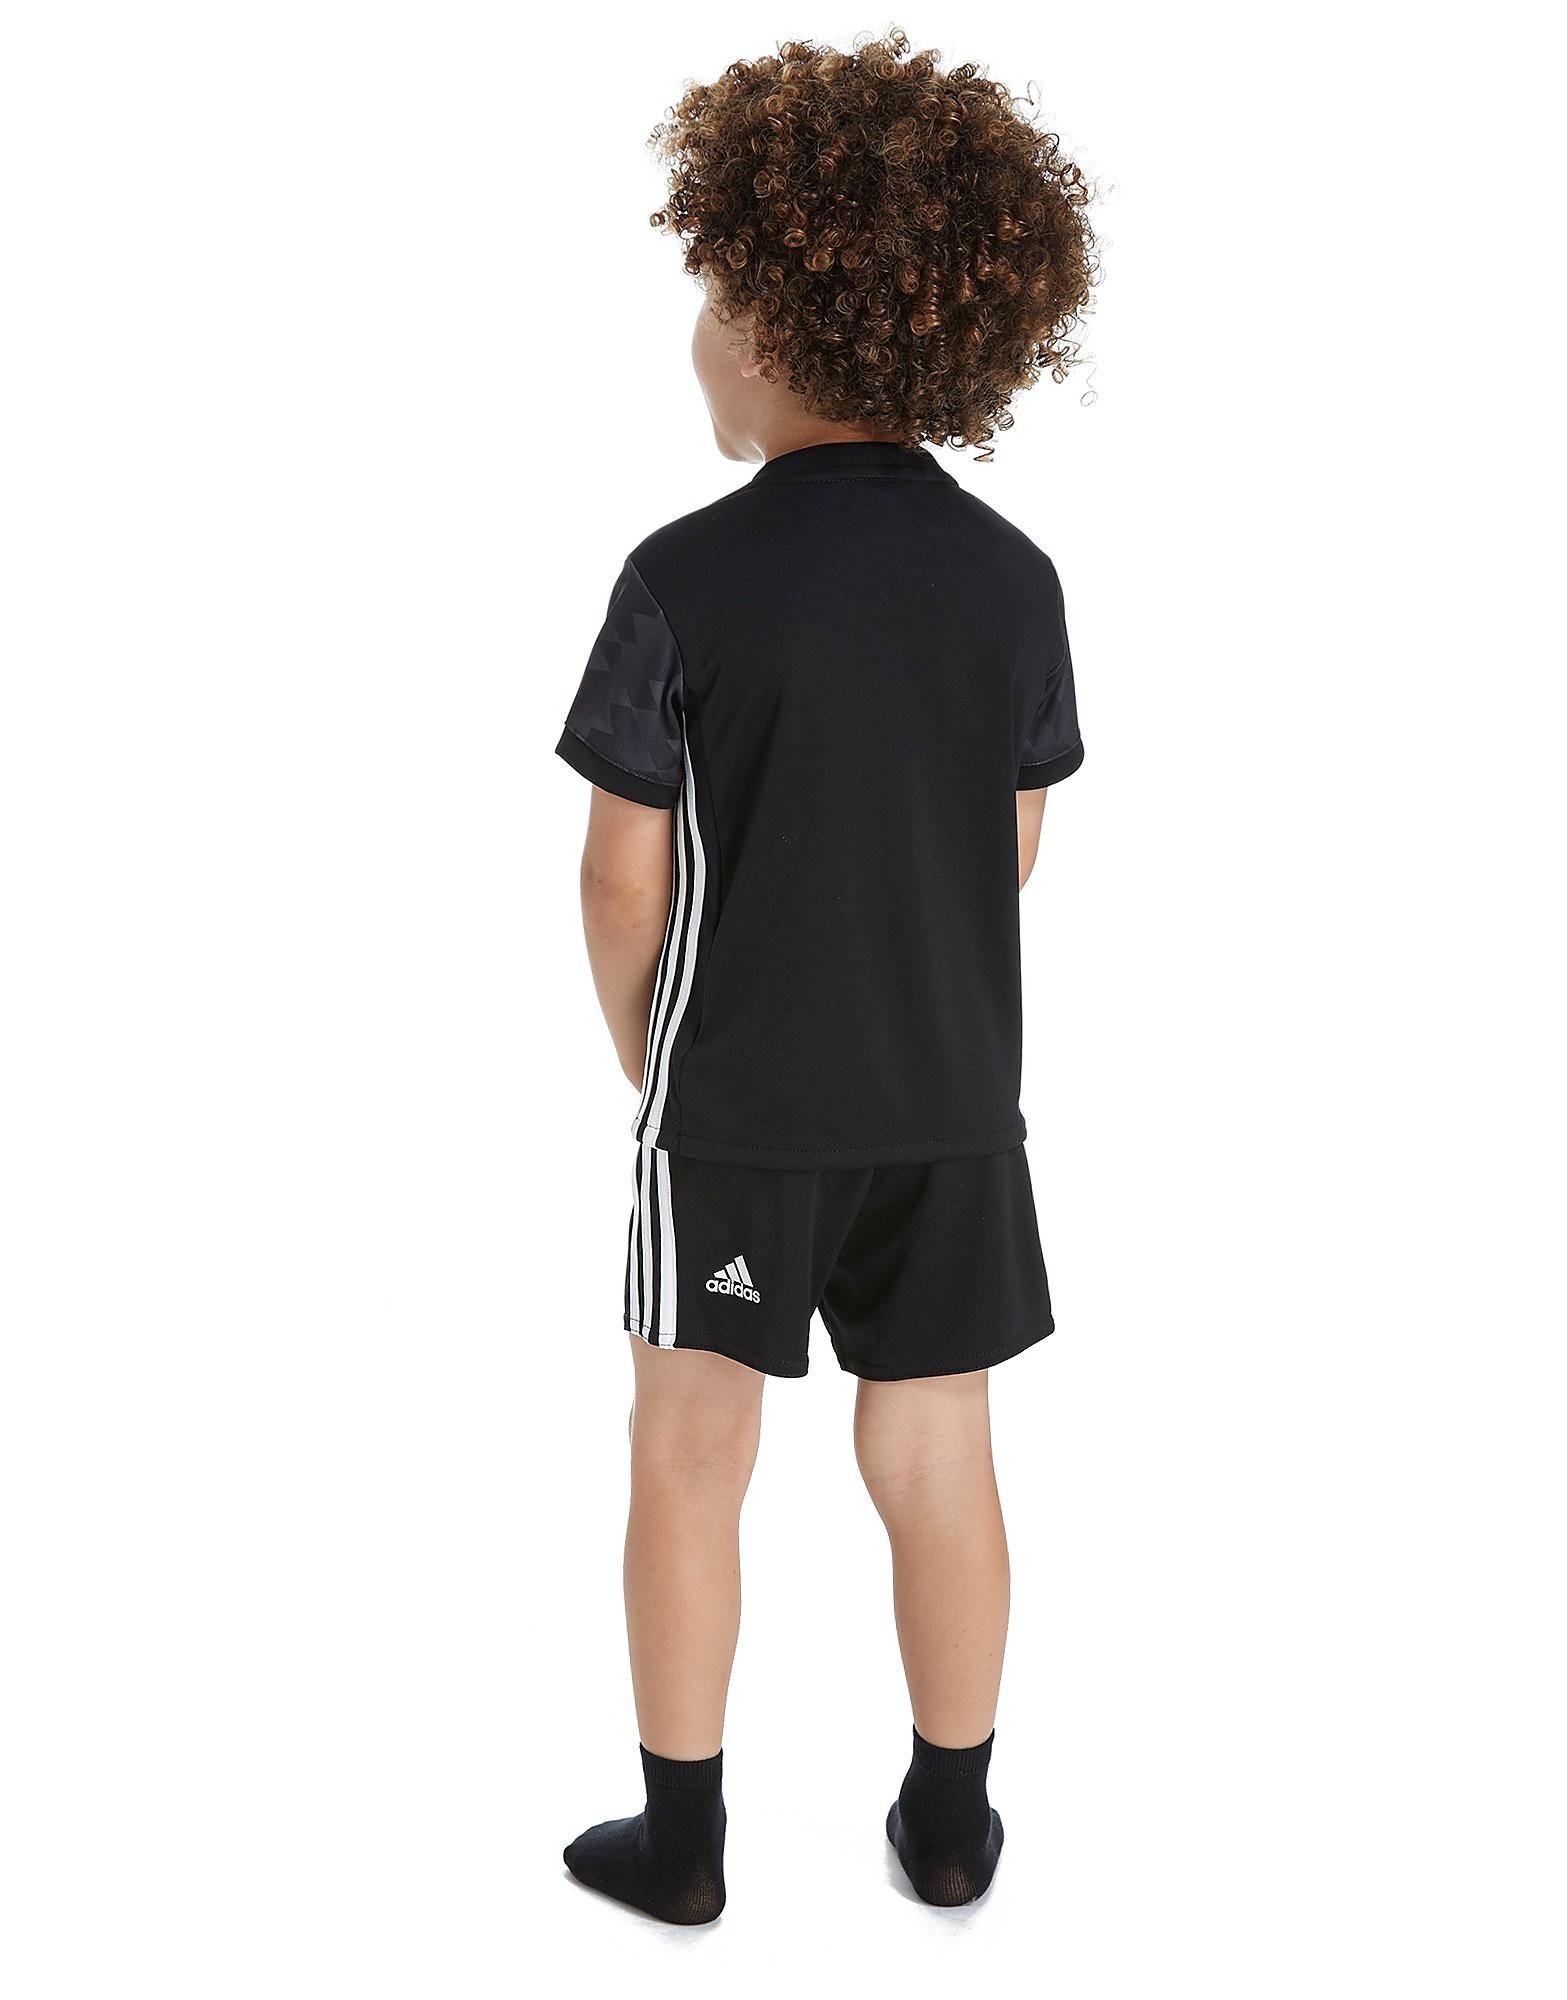 adidas Manchester United FC 2017 Away Kit Infant